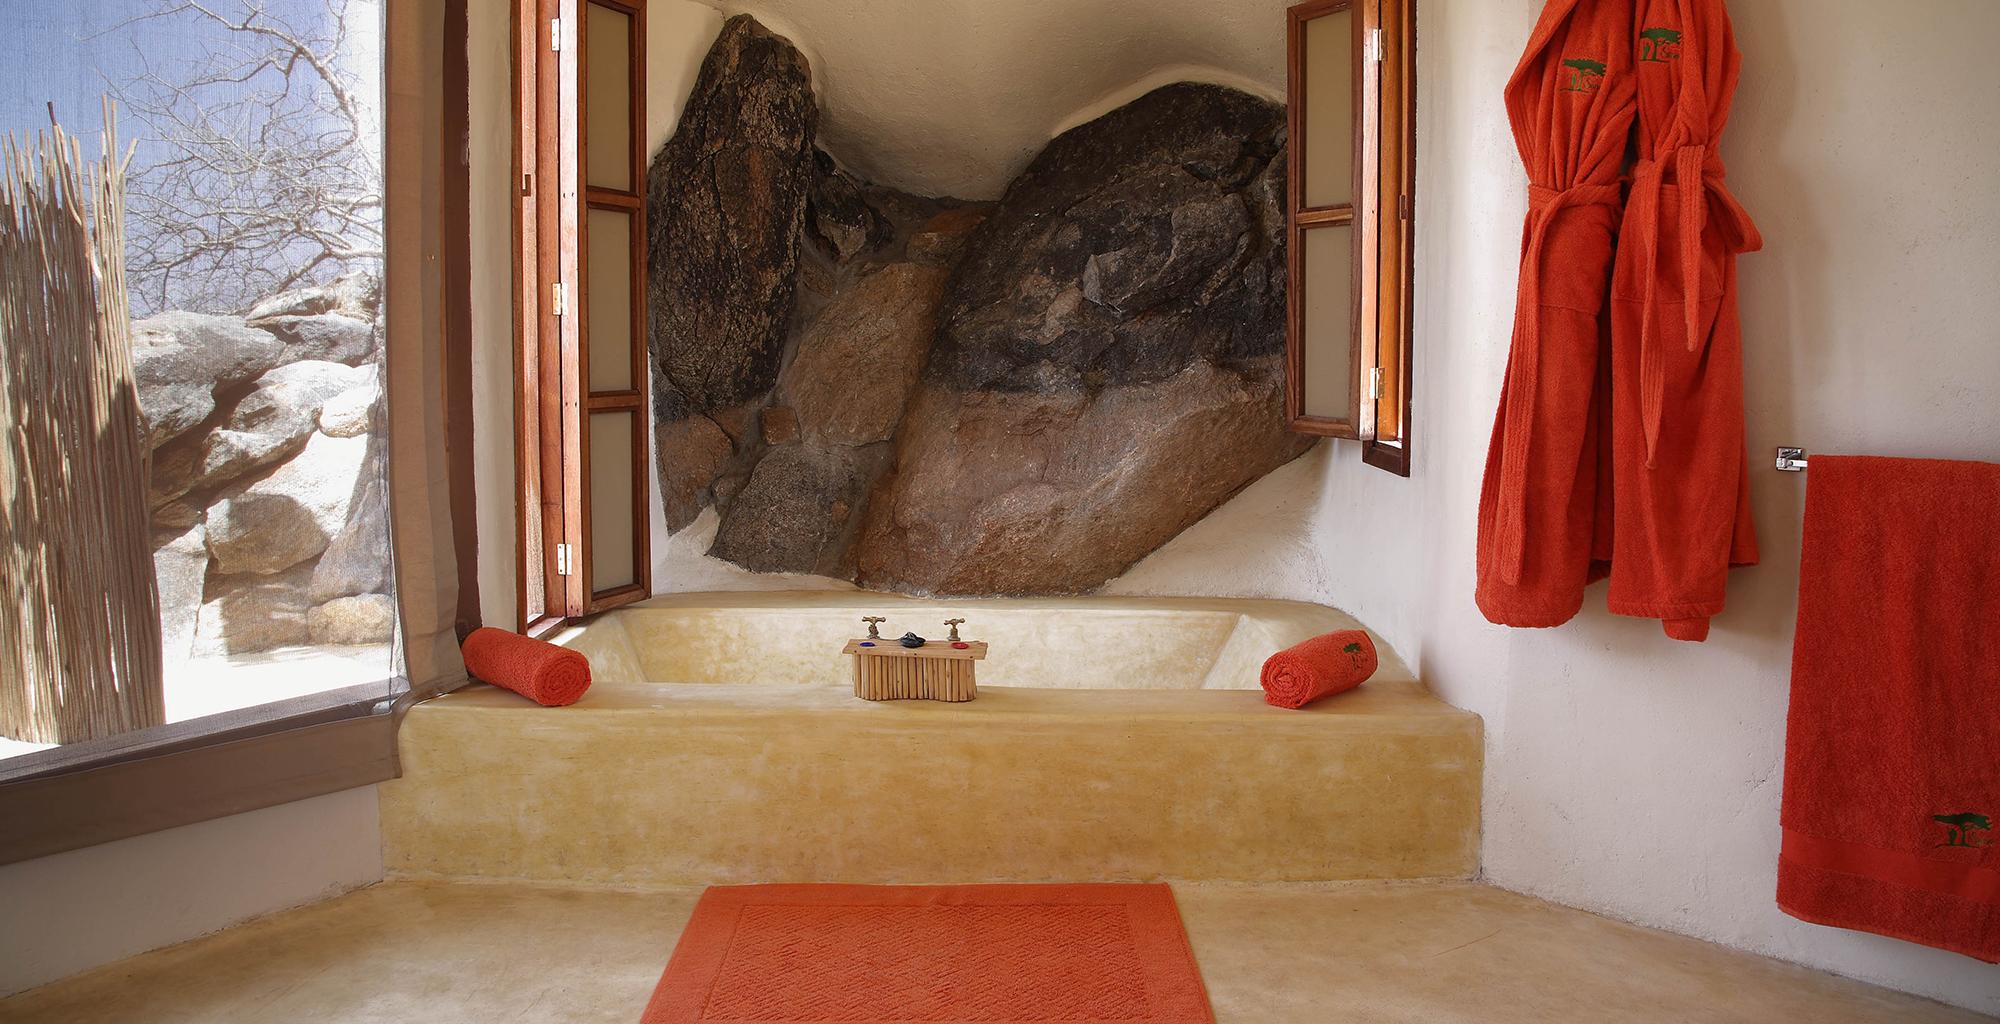 Kenya-Saruni-Samburu-Bathroom